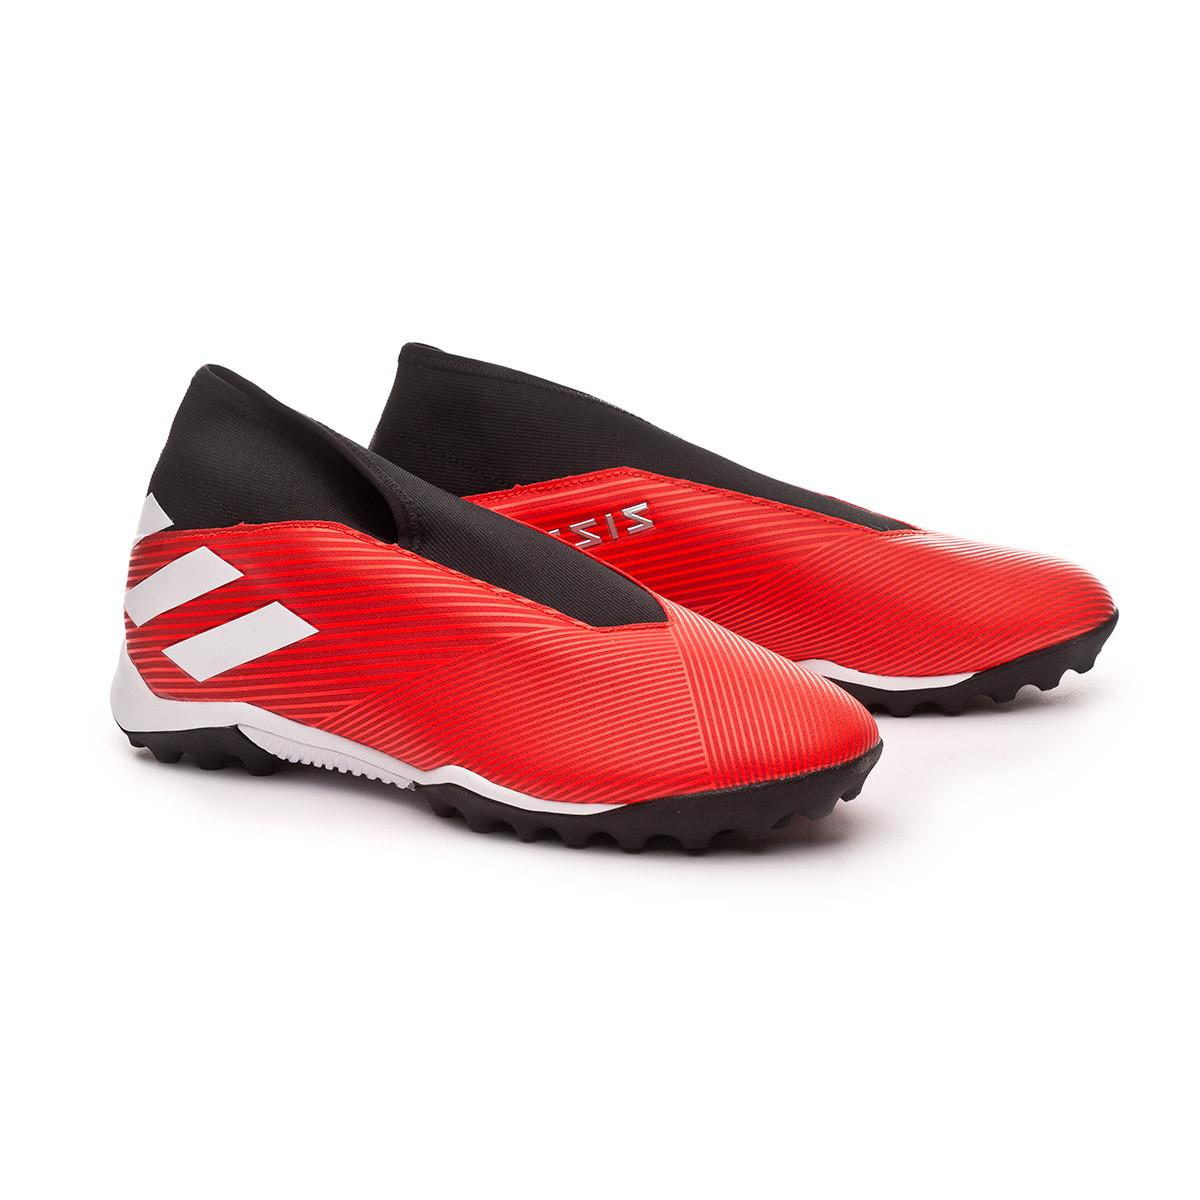 Chaussure de foot adidas Nemeziz 19.3 Laceless Turf